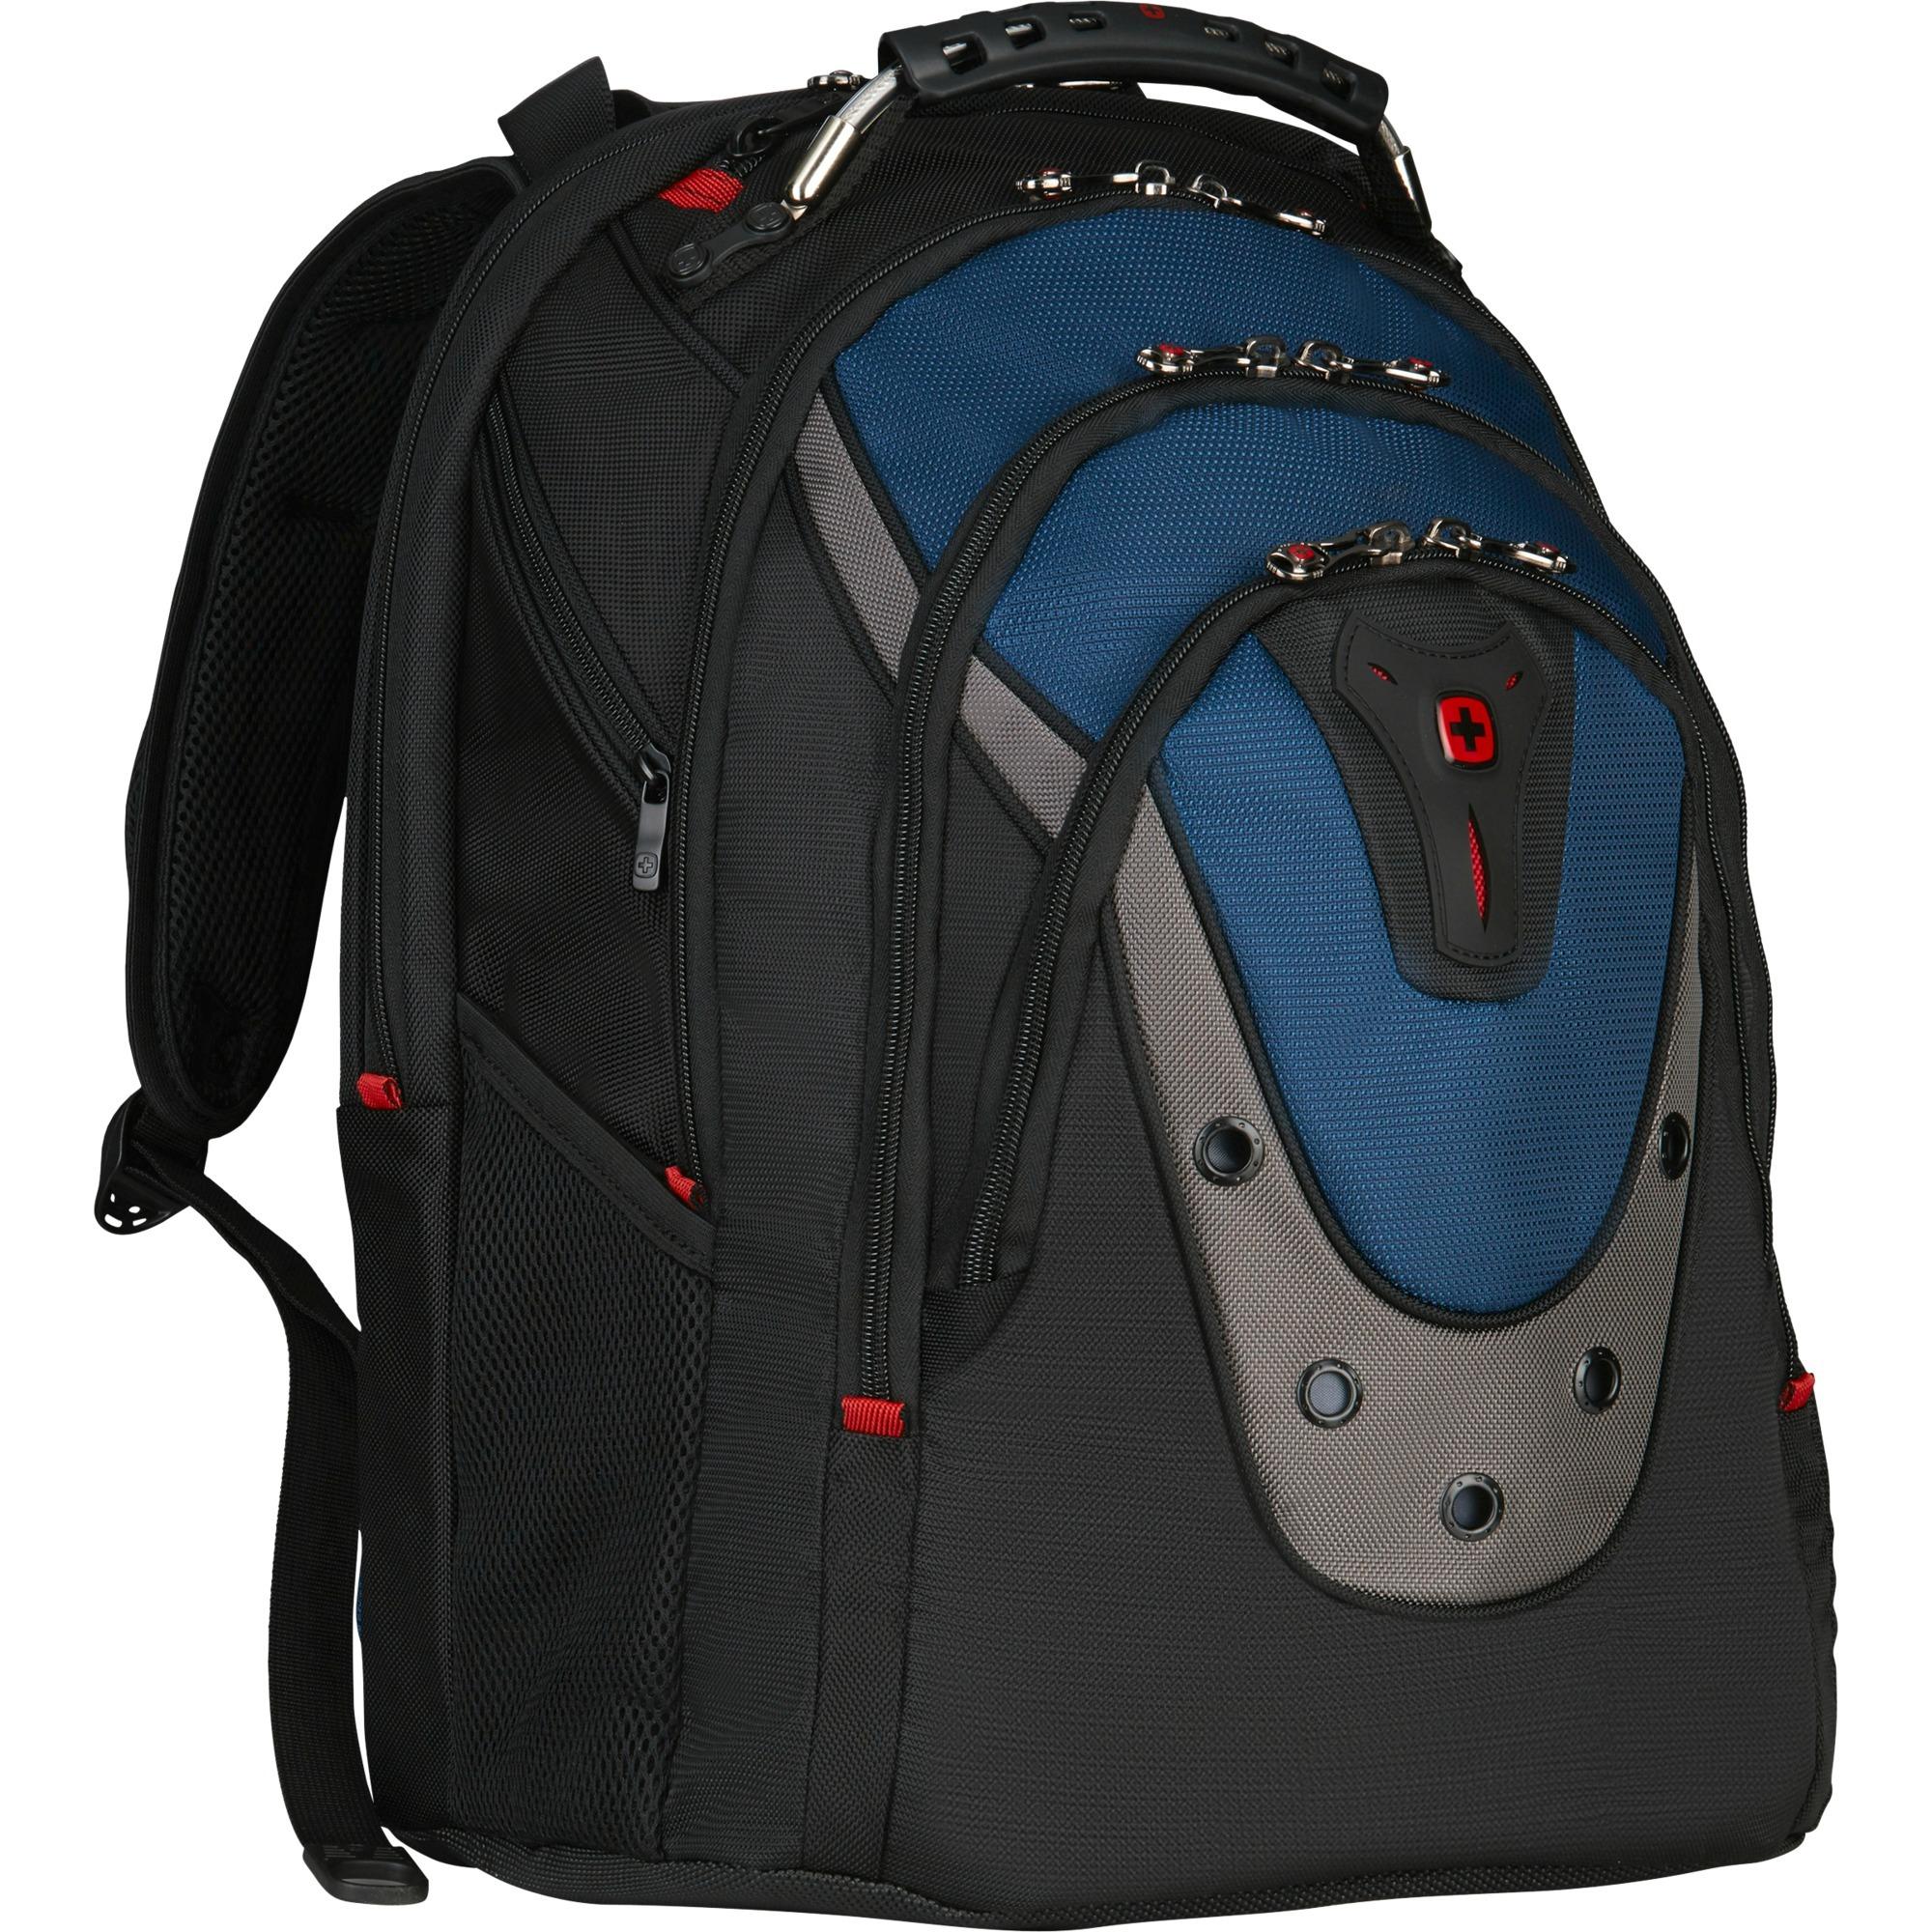 "600638 17"" Mochila Negro, Azul maletines para portátil"